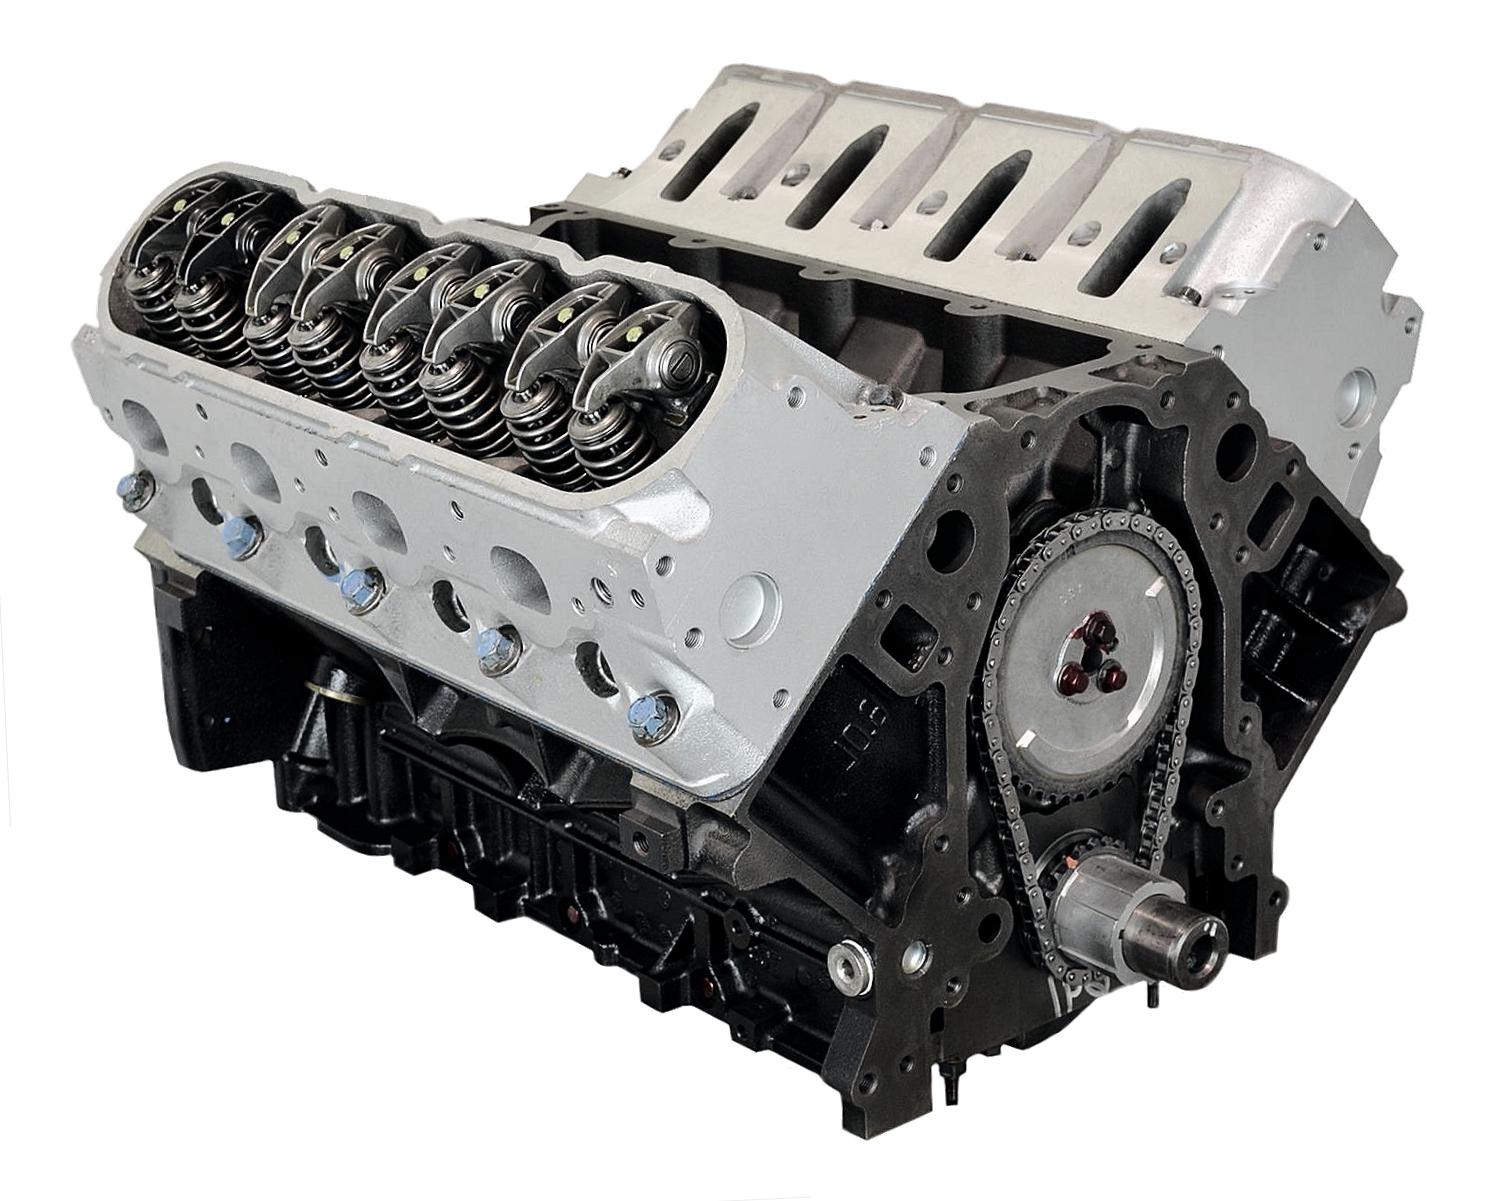 5.3 GM L59 Reman Long Block Engine Chevrolet Suburban 1500 Vin Code: T